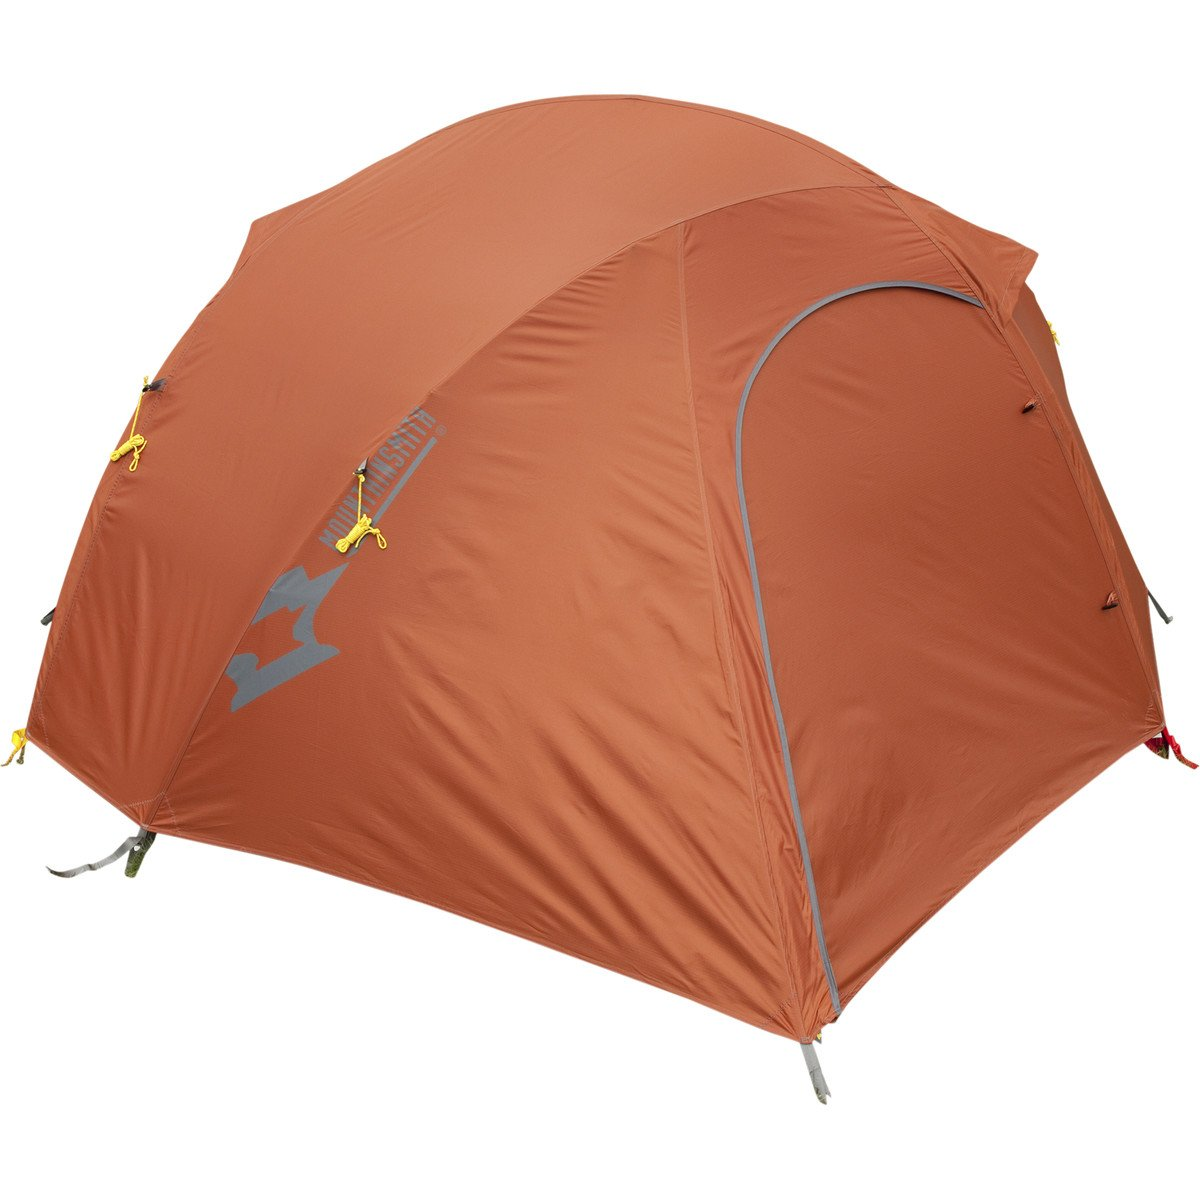 Amazon.com  Mountainsmith Dome 2 Person 3 Season Tent Burnt Ochre Burnt Ochre  Sports u0026 Outdoors  sc 1 st  Amazon.com & Amazon.com : Mountainsmith Dome 2 Person 3 Season Tent Burnt Ochre ...